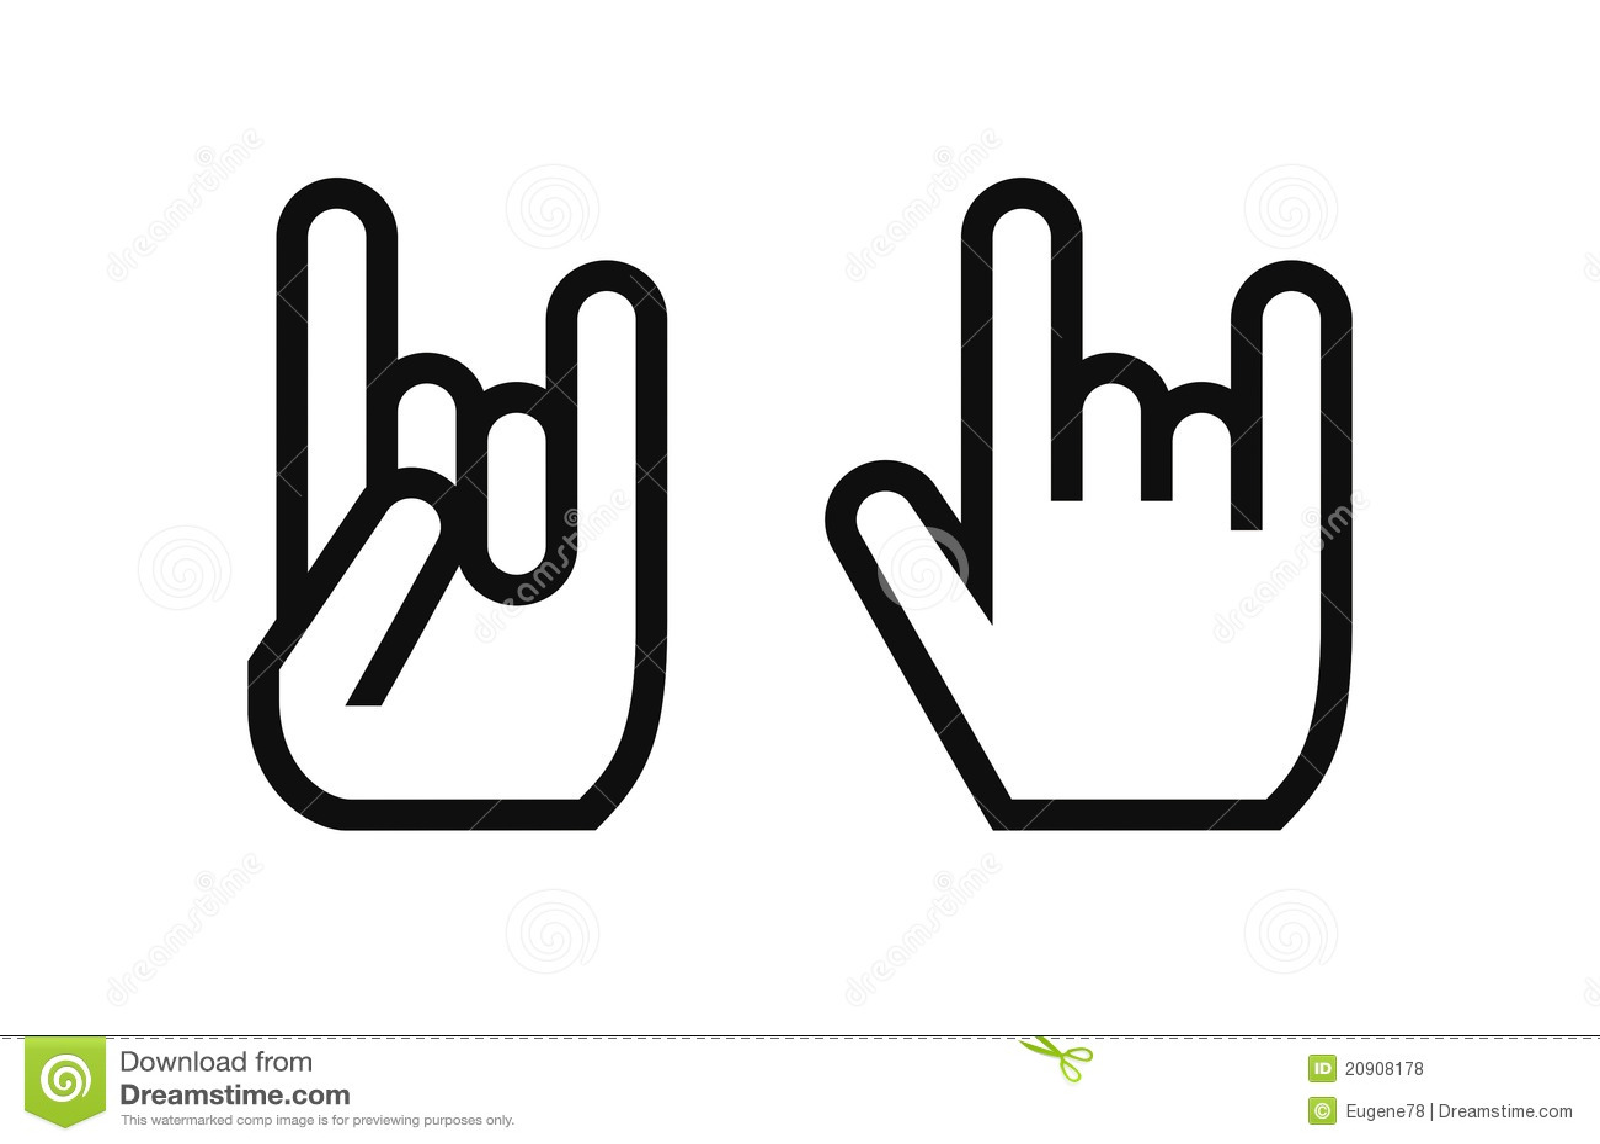 Rock culture symbol stock vector illustration of fingers 20908178 rock culture symbol buycottarizona